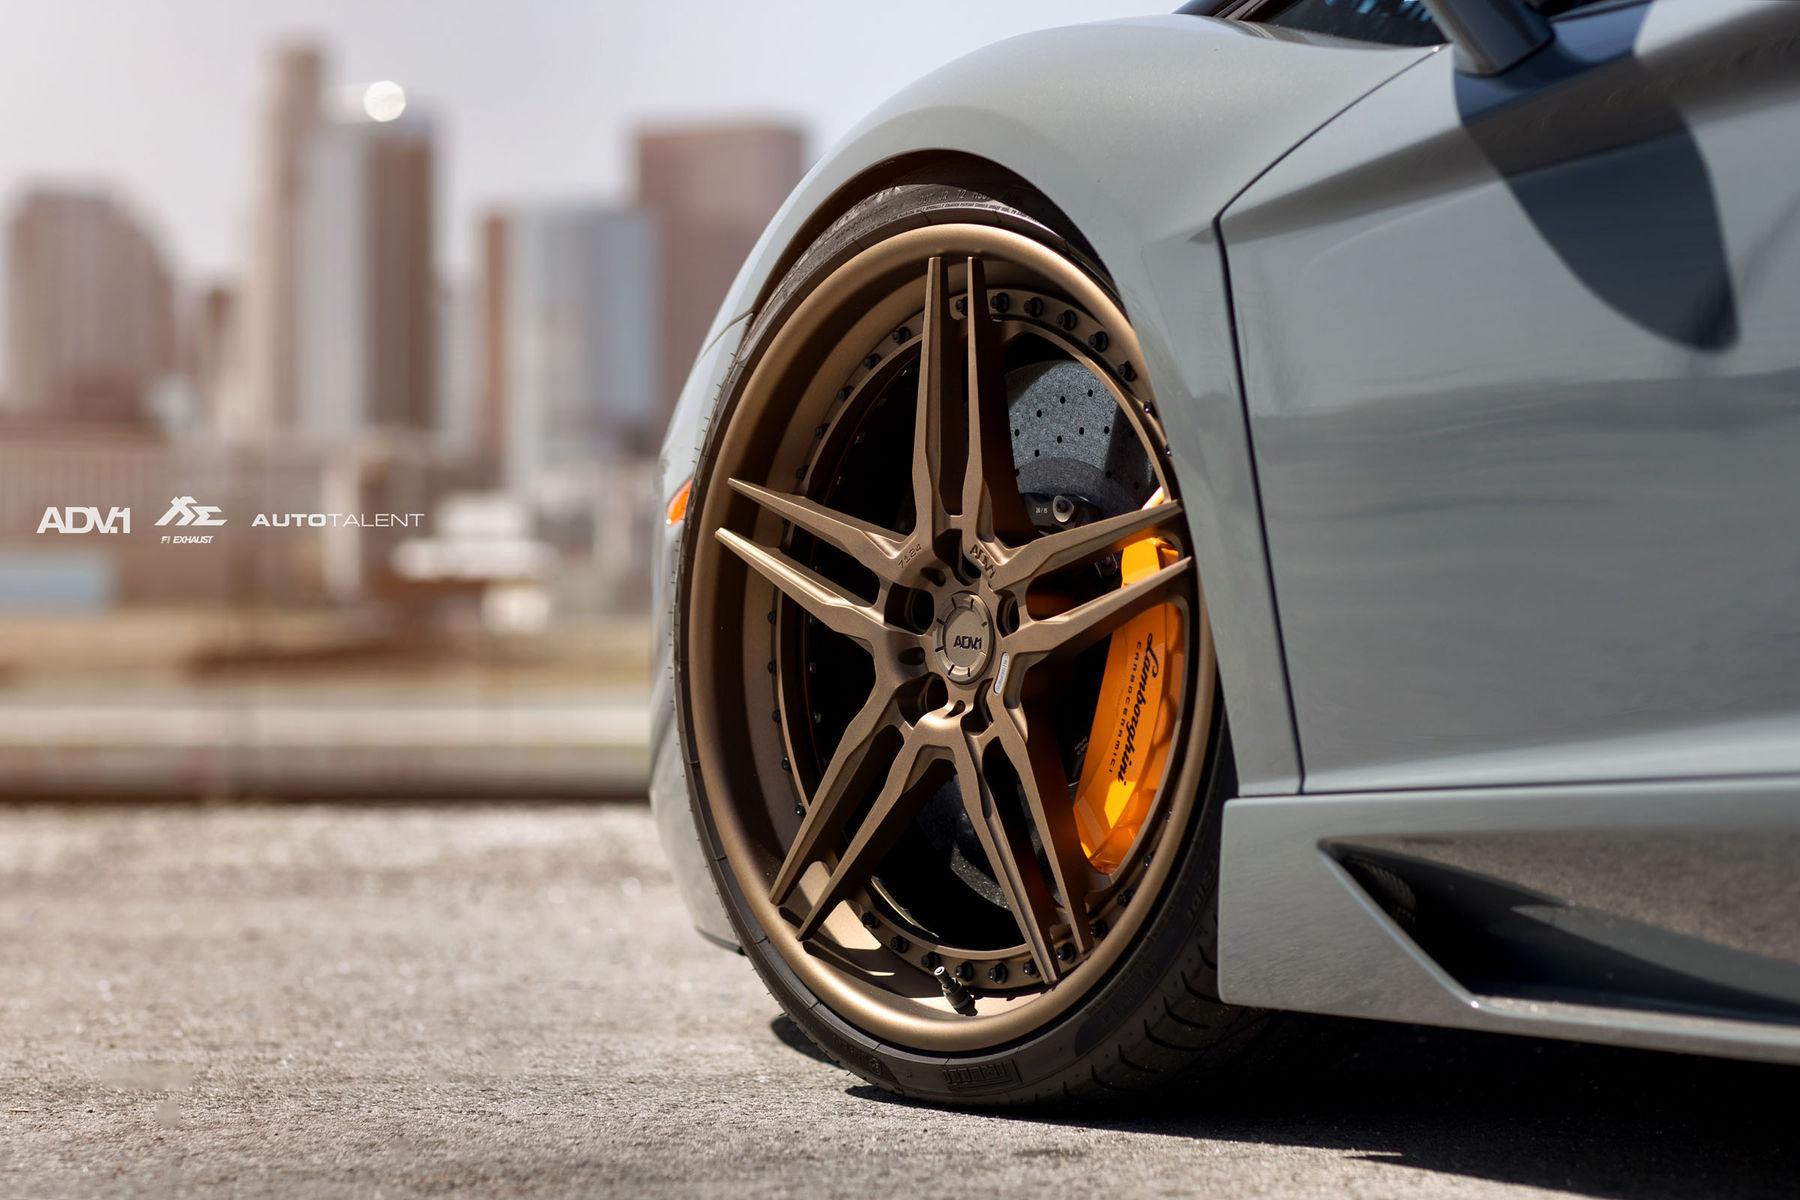 Lamborghini Aventador | ADV.1 Wheels Lamborghini Aventador LP700